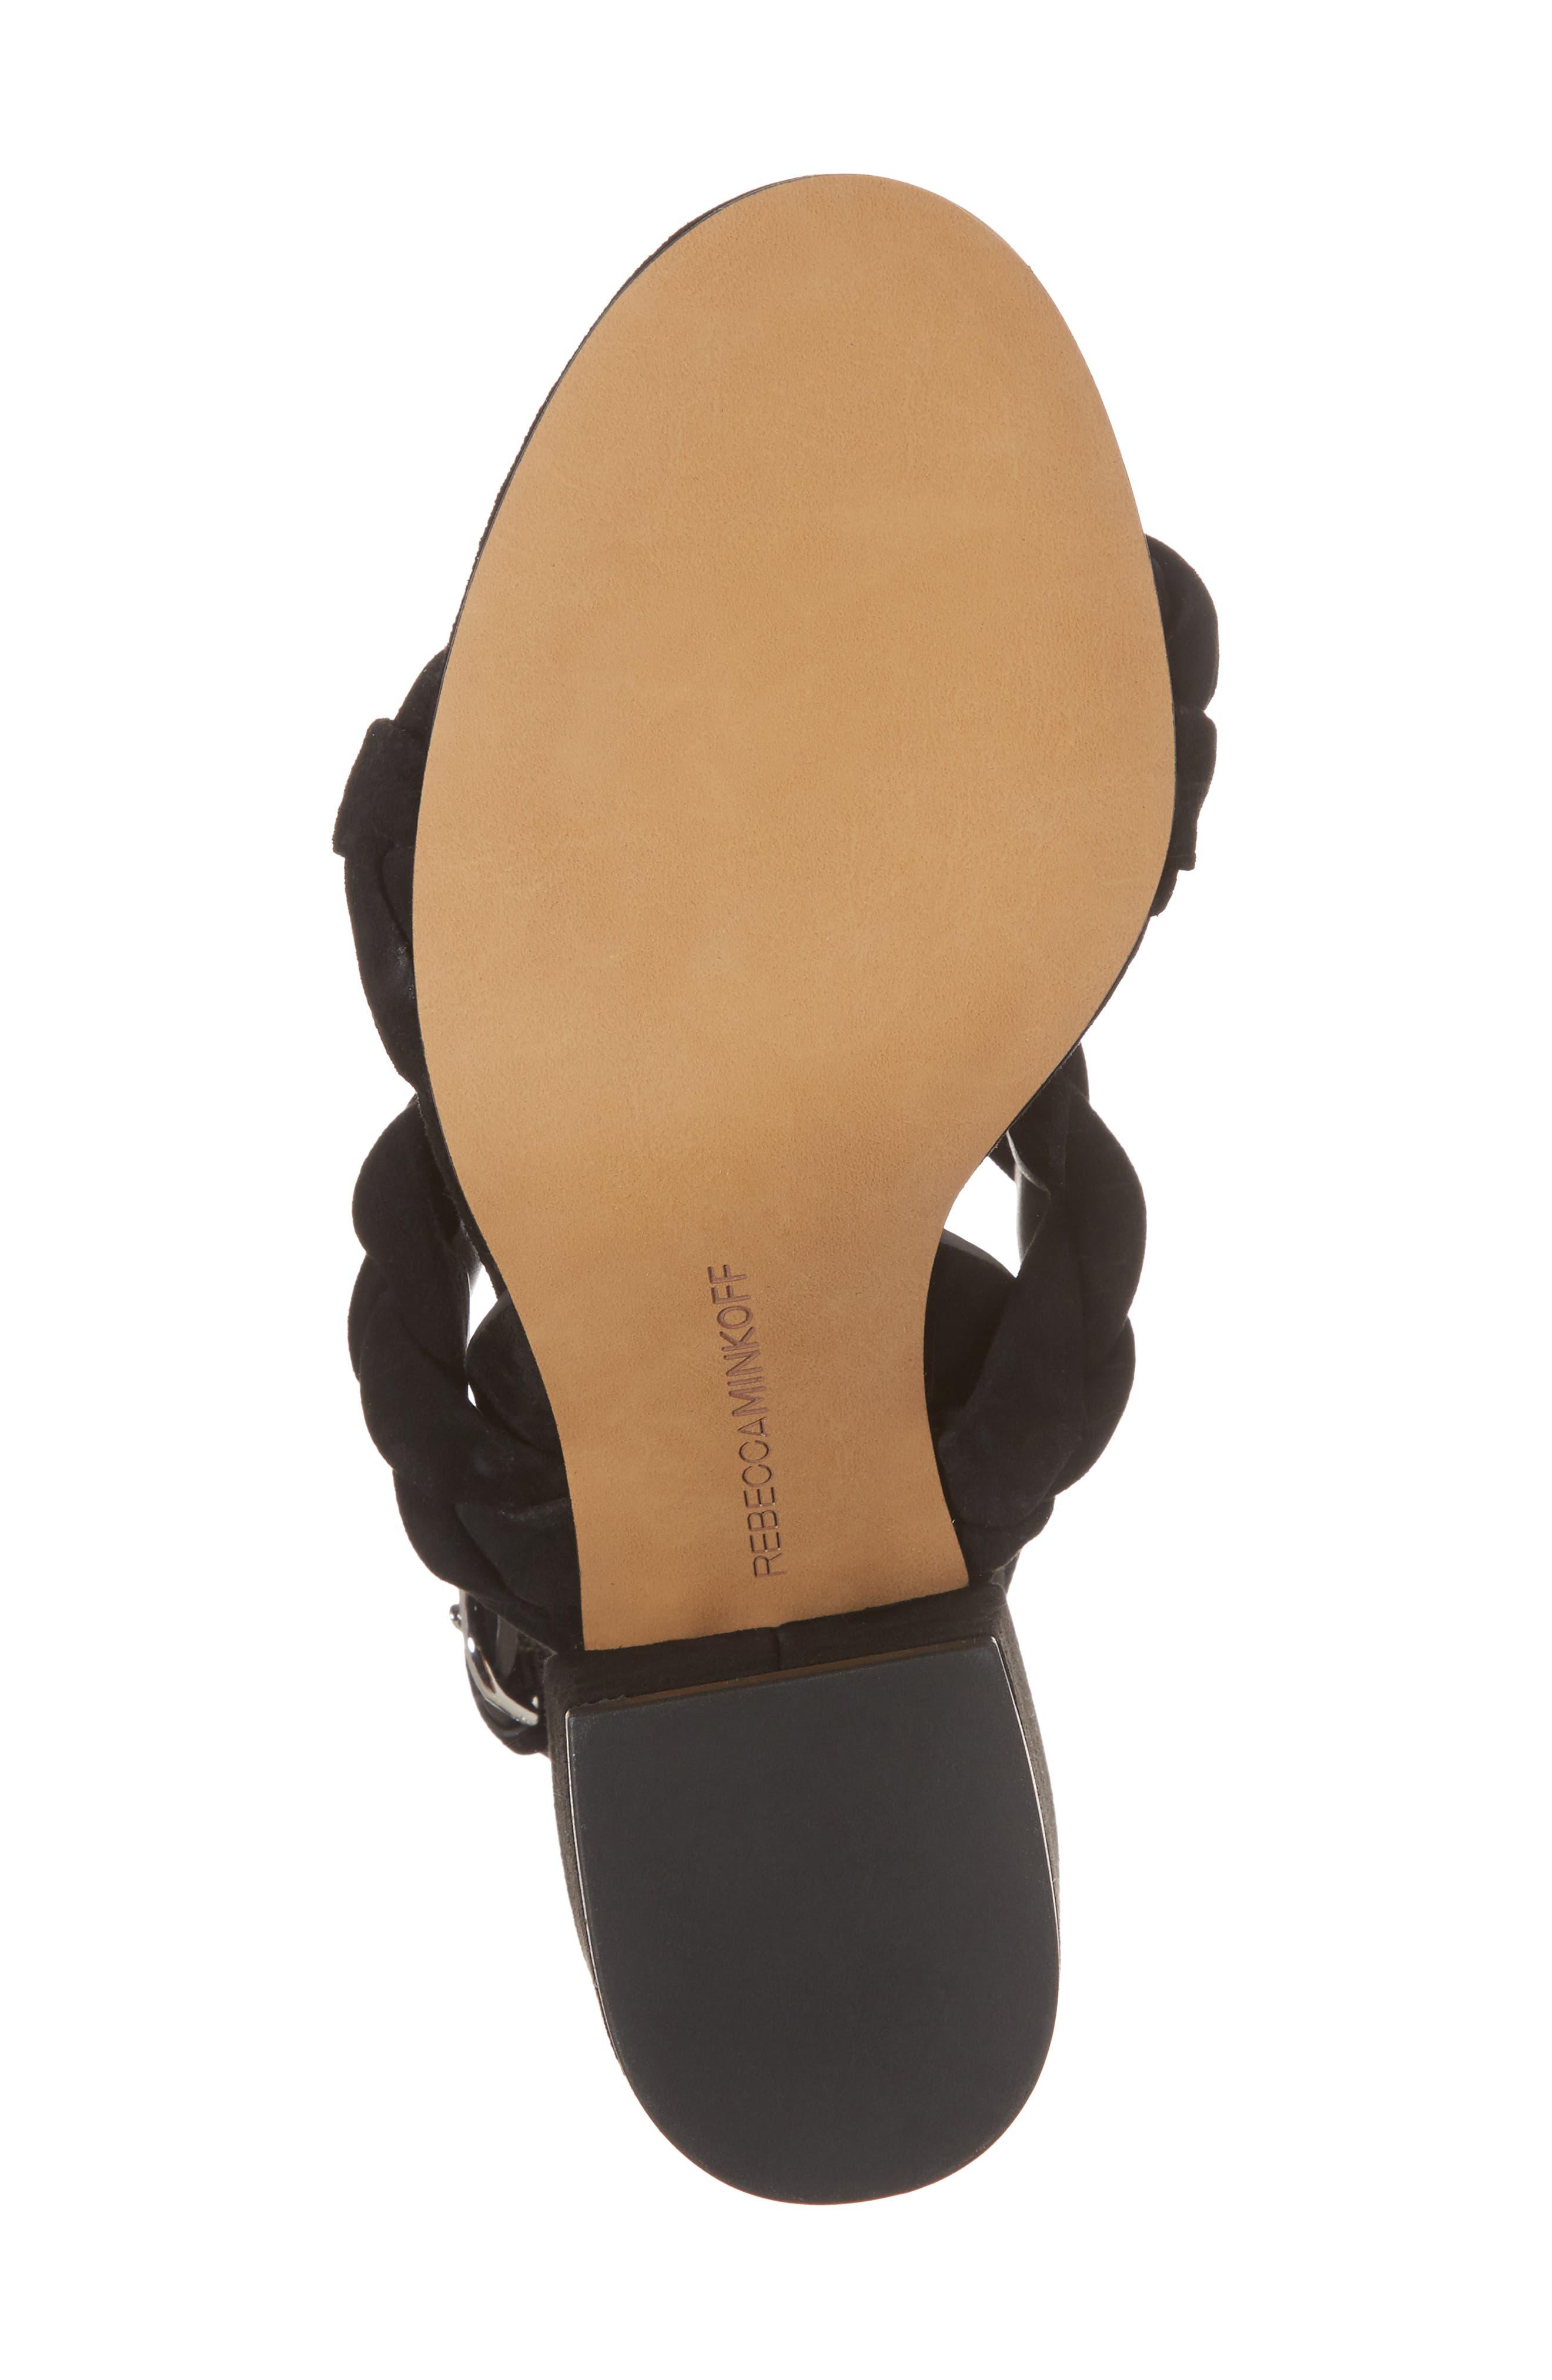 Candance Block Heel Sandal,                             Alternate thumbnail 6, color,                             BLACK LEATHER